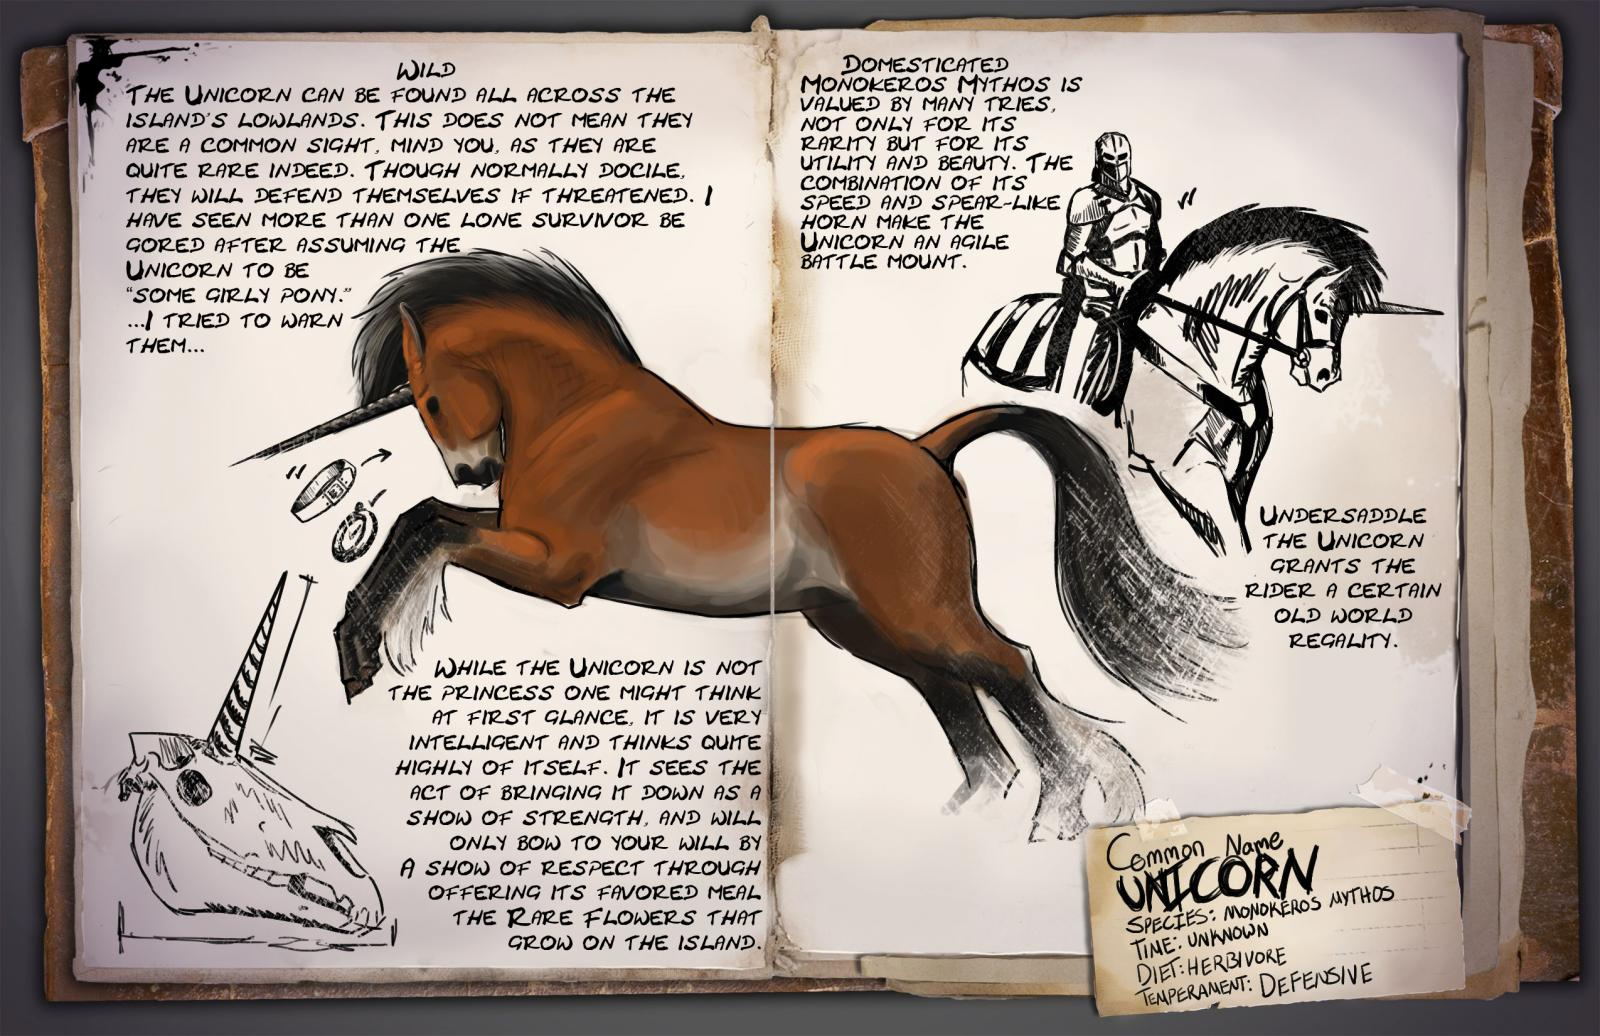 Unicorn Dossier